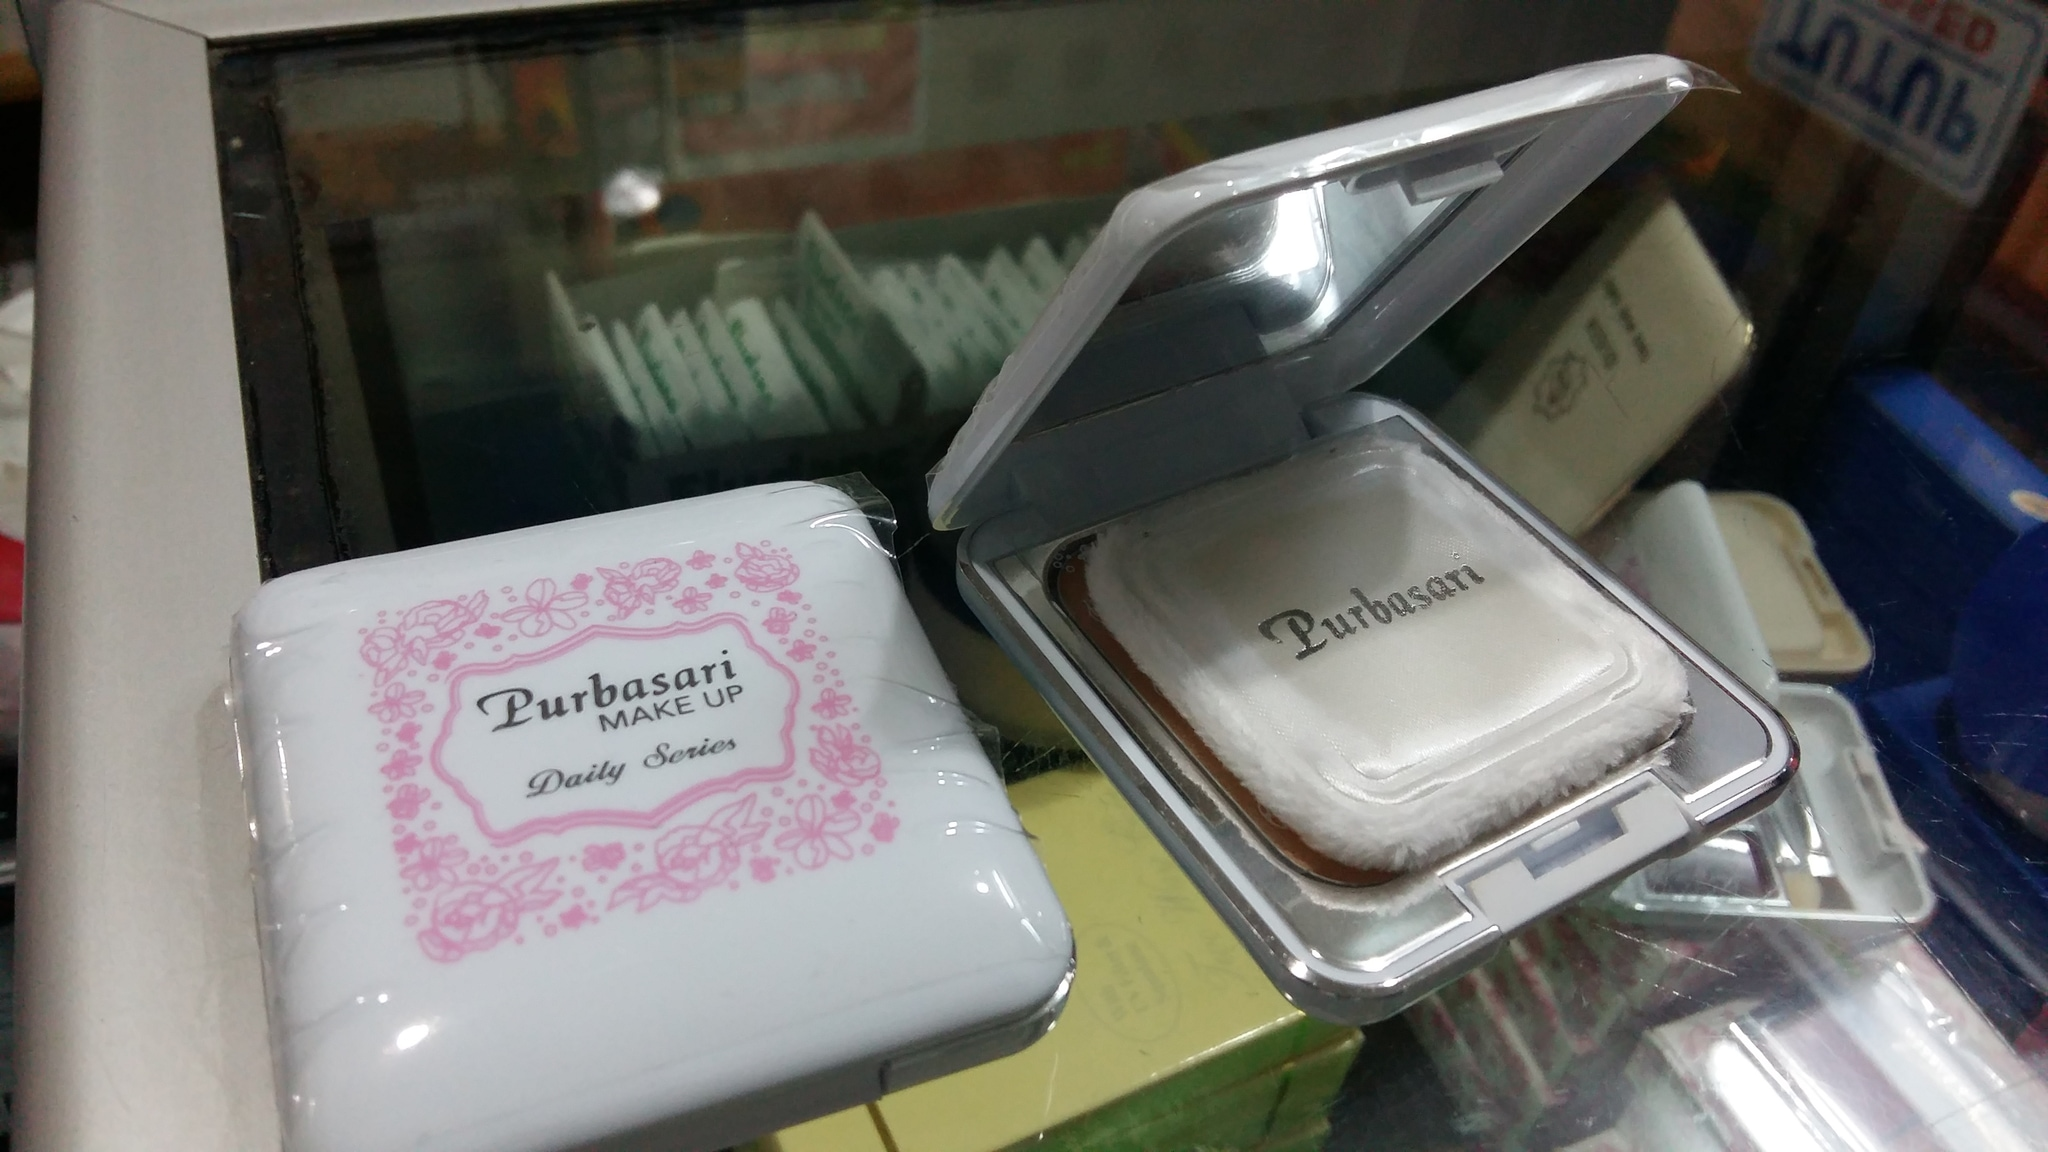 Purbasari Face Powder Daily Series 01 Natural 30gr Daftar Harga Foundation Tac Jual Compact